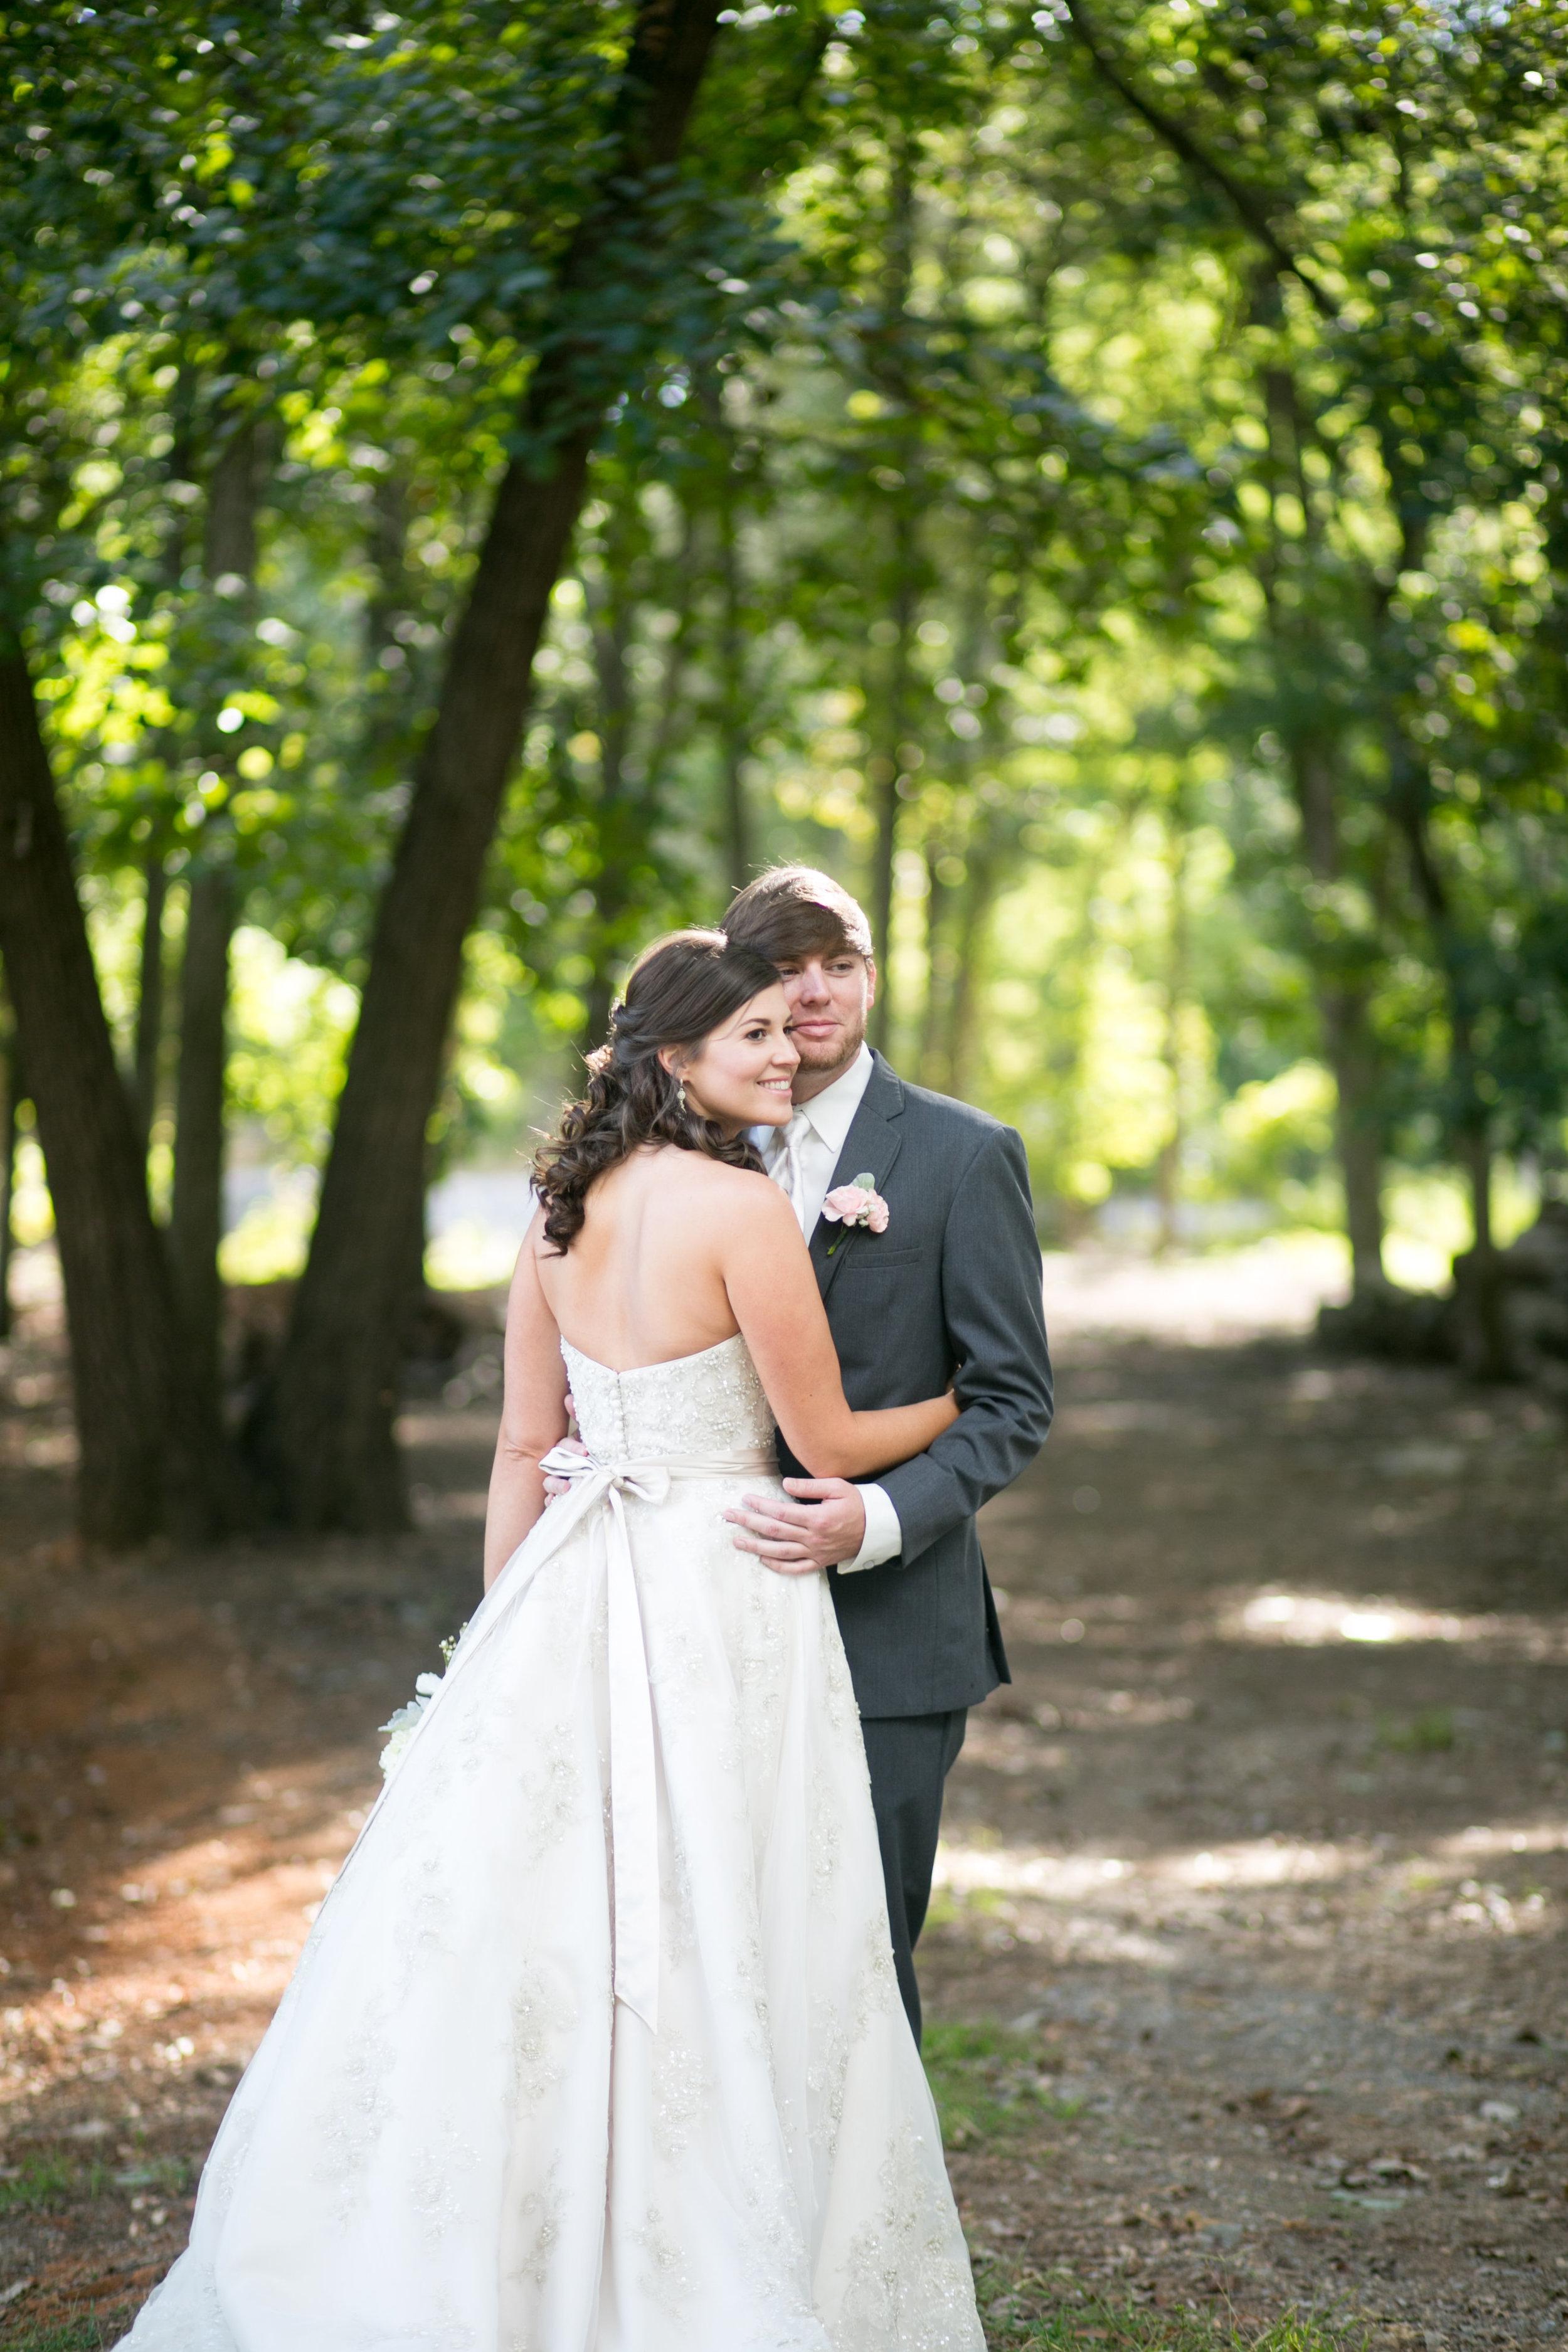 swain_wedding16_037.jpg